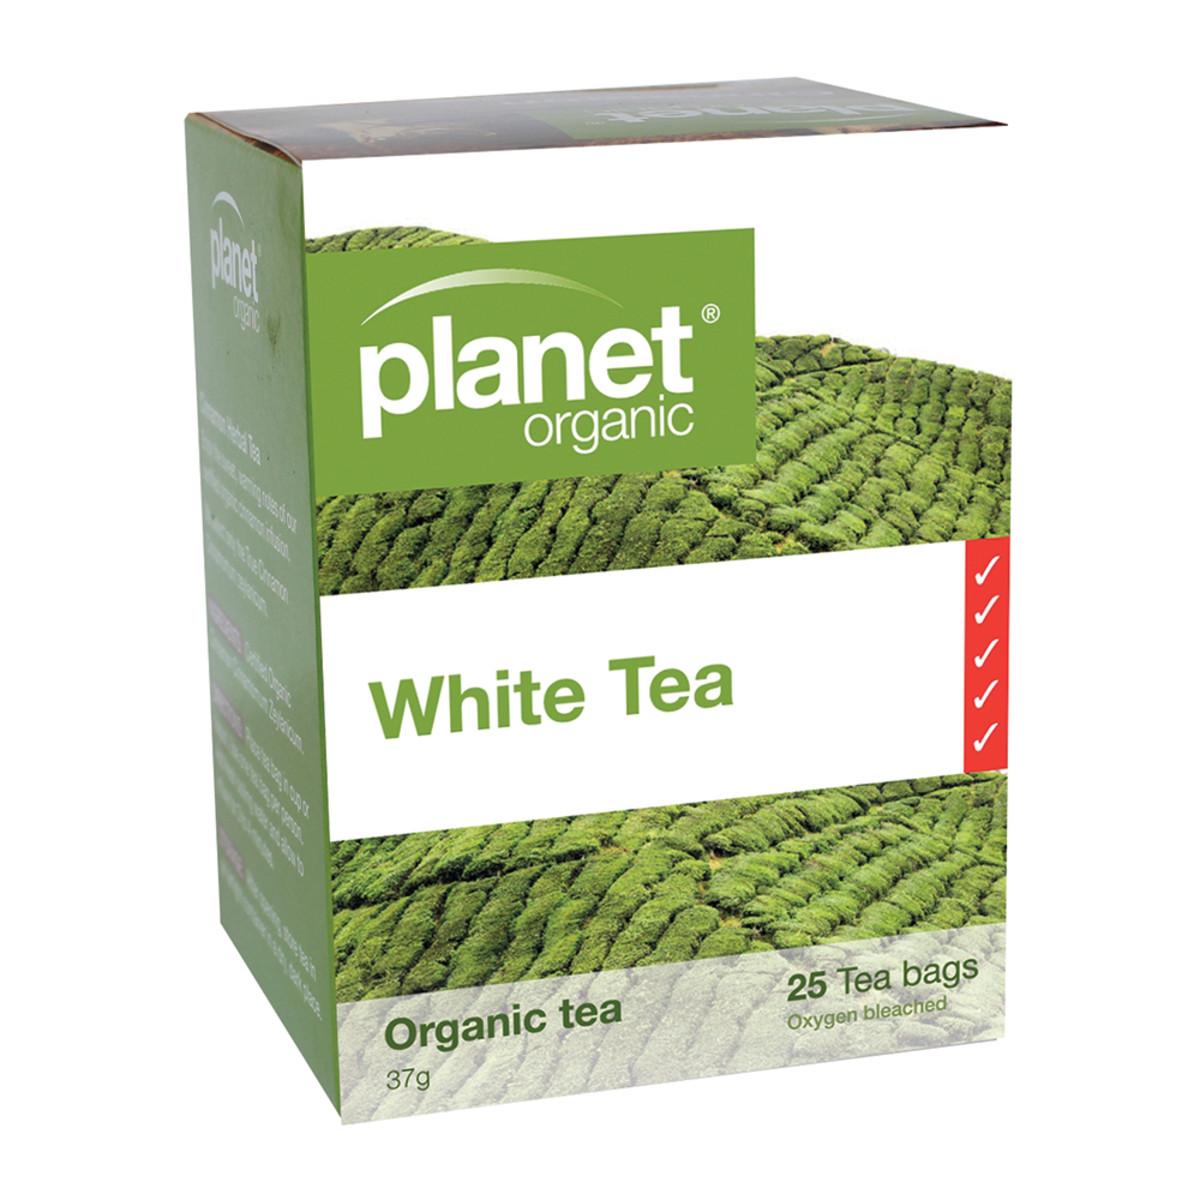 PLANET ORGANIC WHITE TEA ORG 25TB